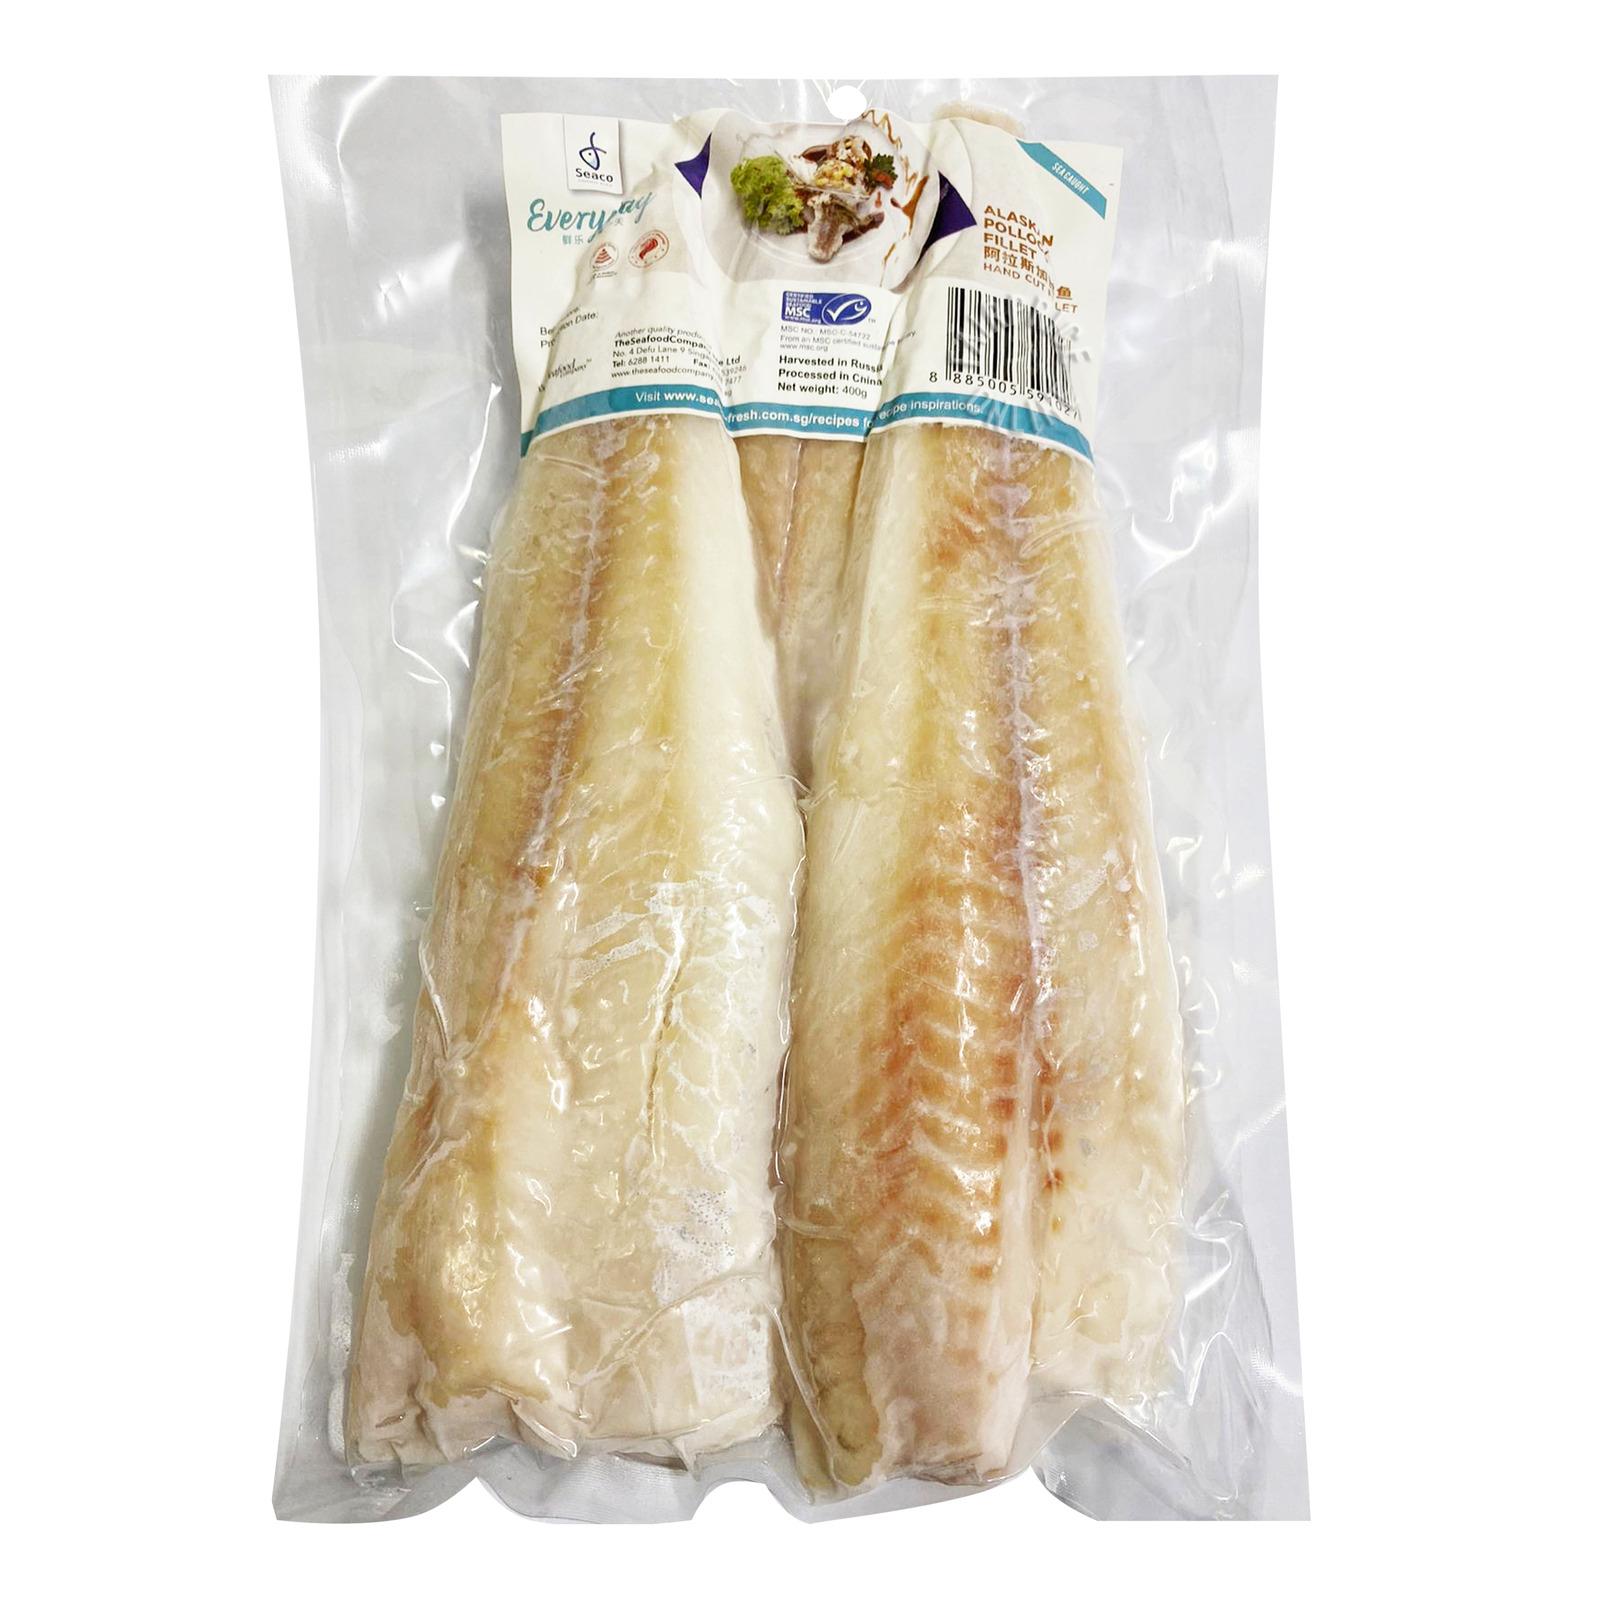 Seaco Frozen Fish Fillet - Alaskan Pollock